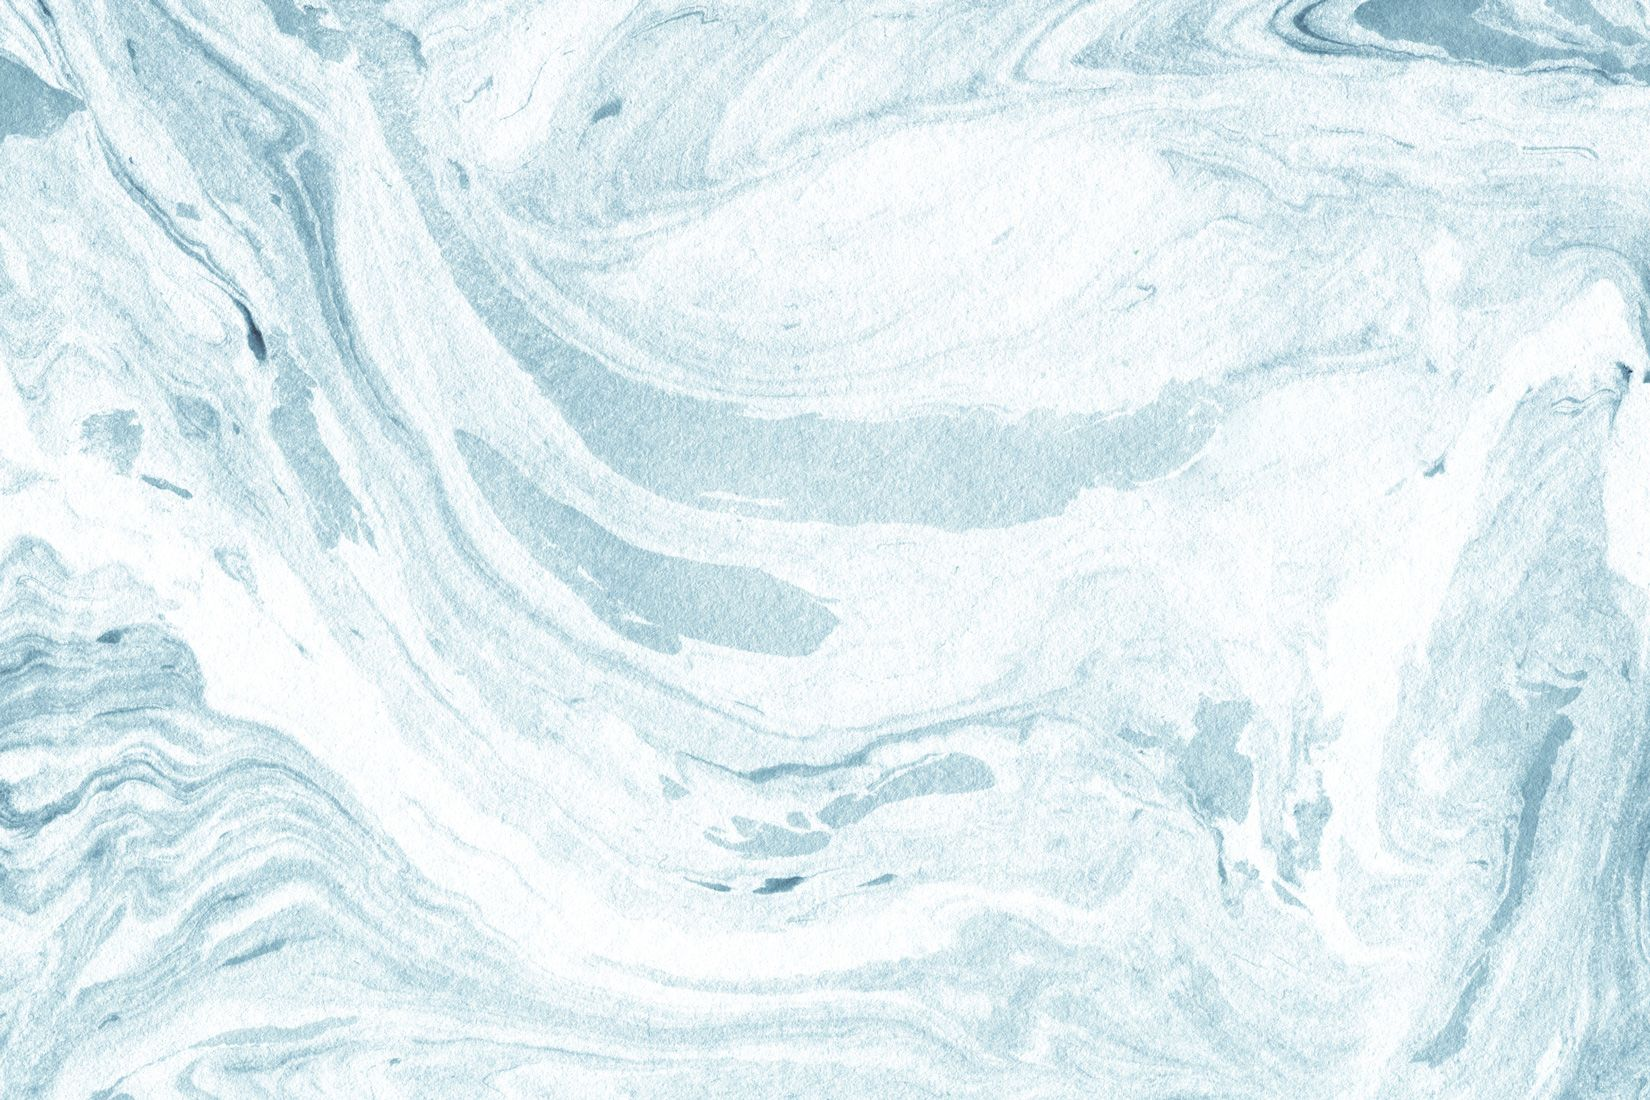 Blue And White Marbleized Wallpaper Mural Murals Wallpaper Marble Desktop Wallpaper Blue Marble Wallpaper Aesthetic Desktop Wallpaper